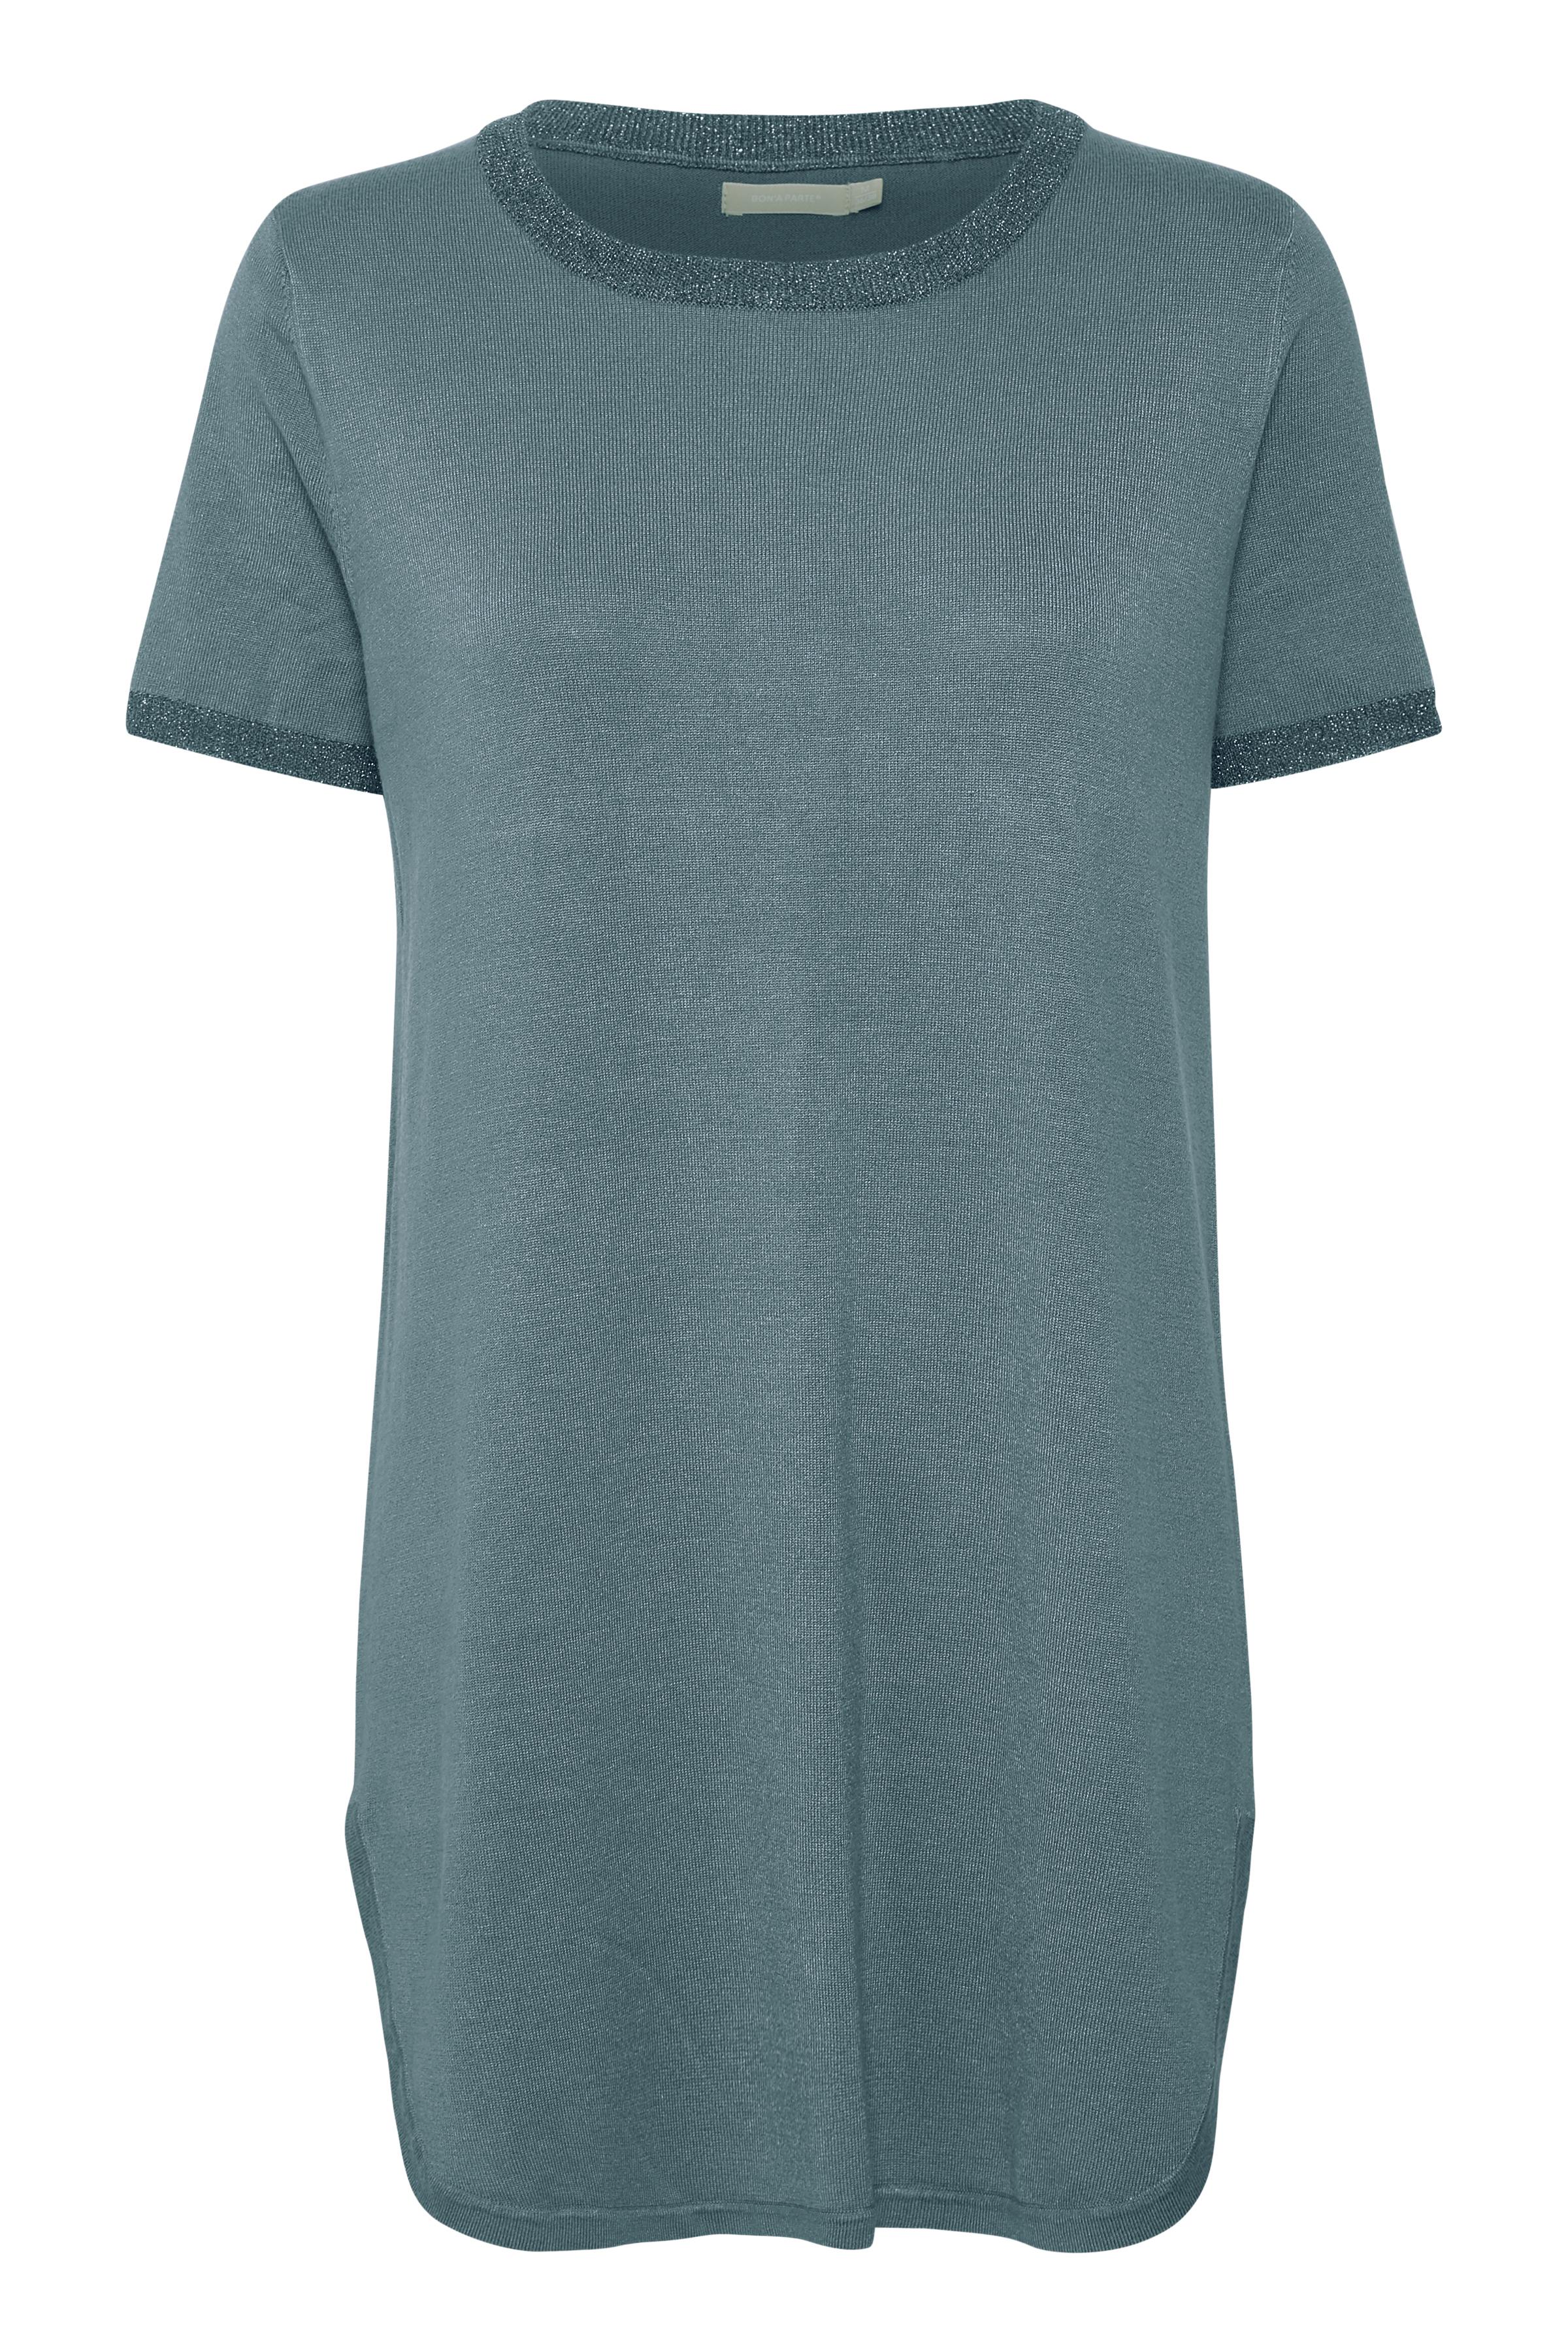 Dimblå Stickad tunika från Bon'A Parte – Köp Dimblå Stickad tunika från stl. S-2XL här